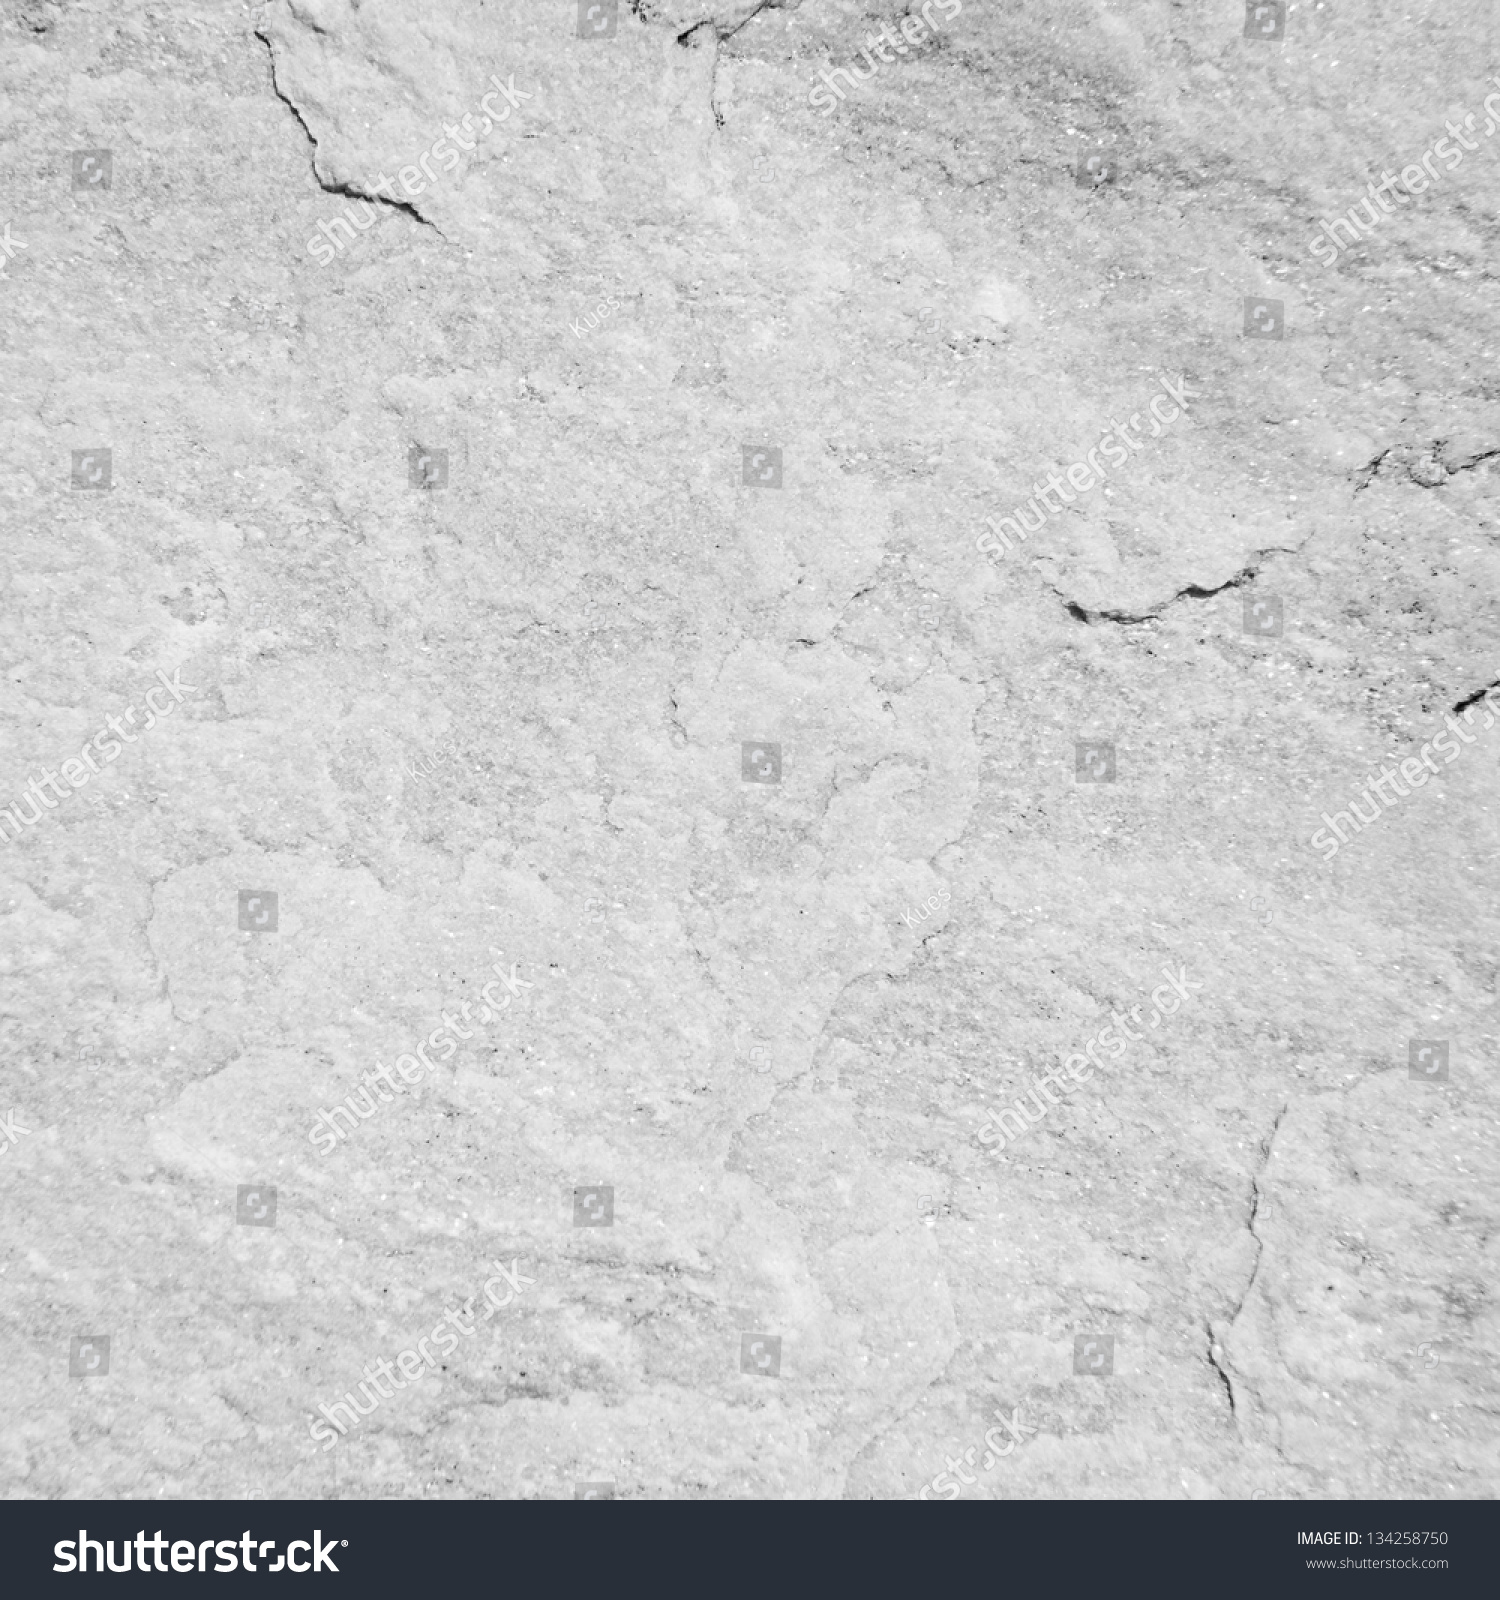 White Granite Background : White stone texture background stock photo